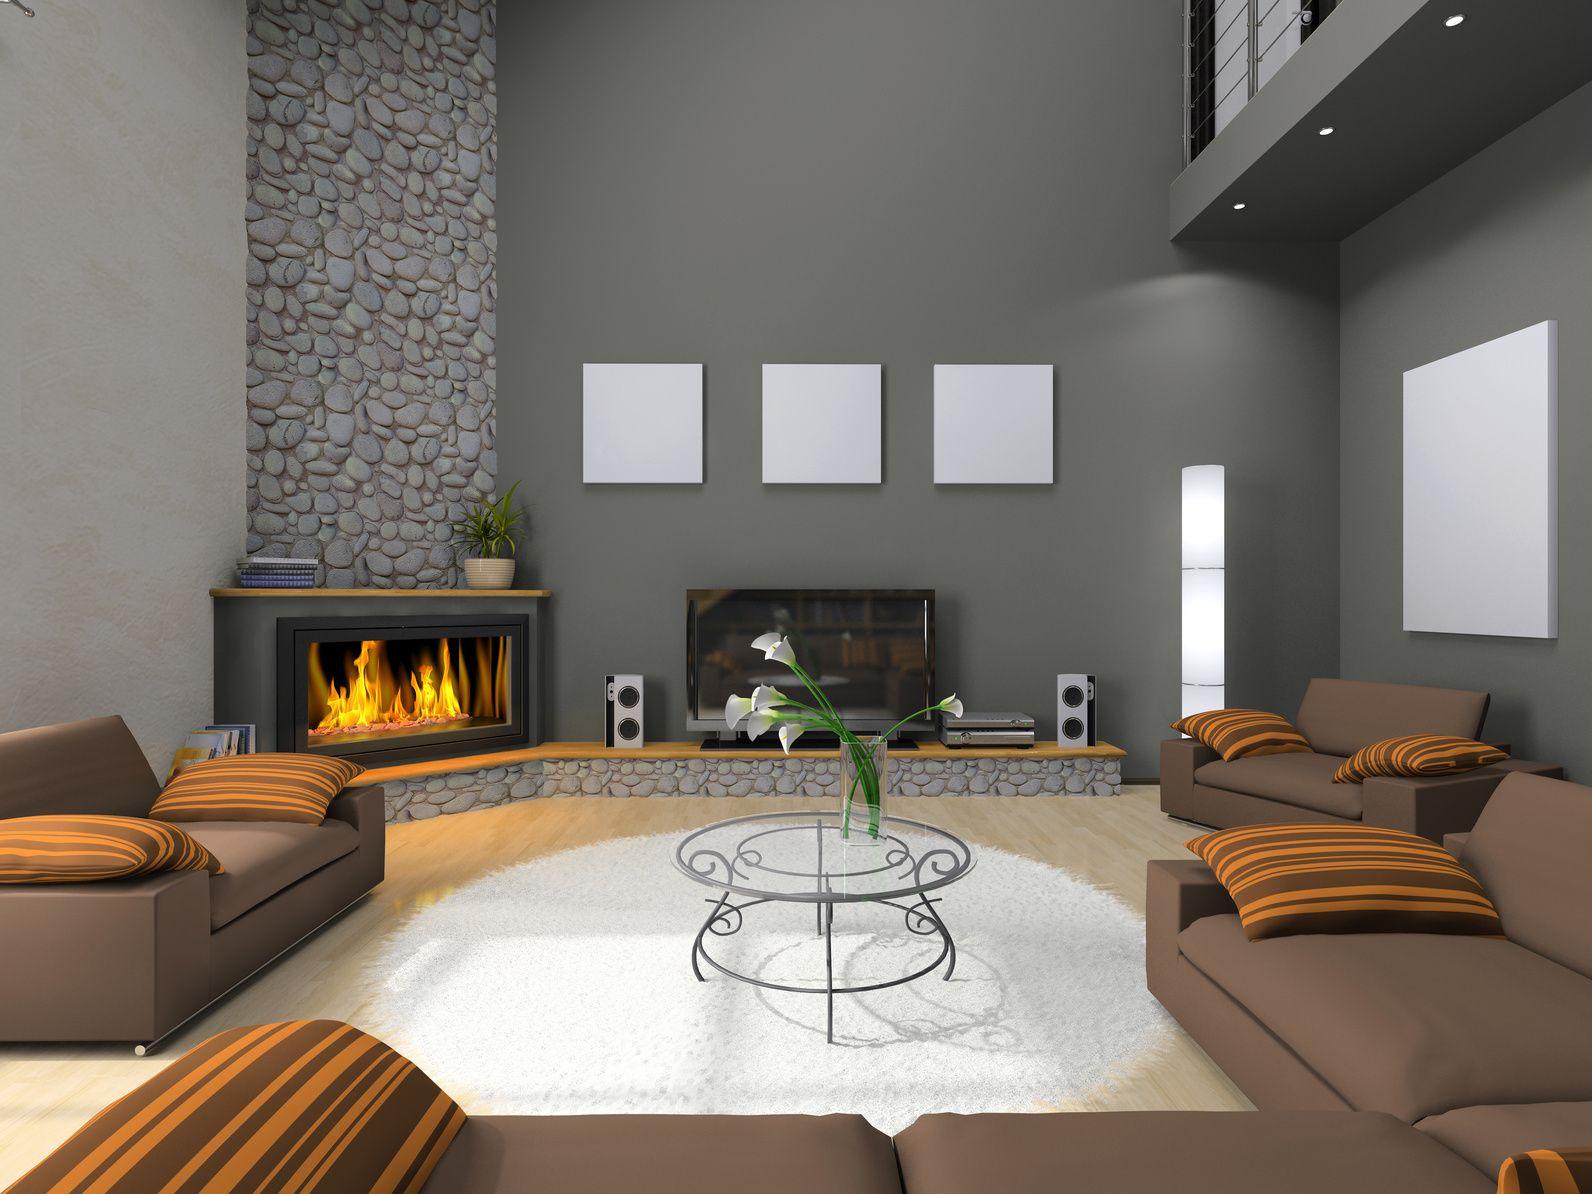 Ikea living room ideas 2012 living room decorating ideas - Ikea living room decorating ideas ...